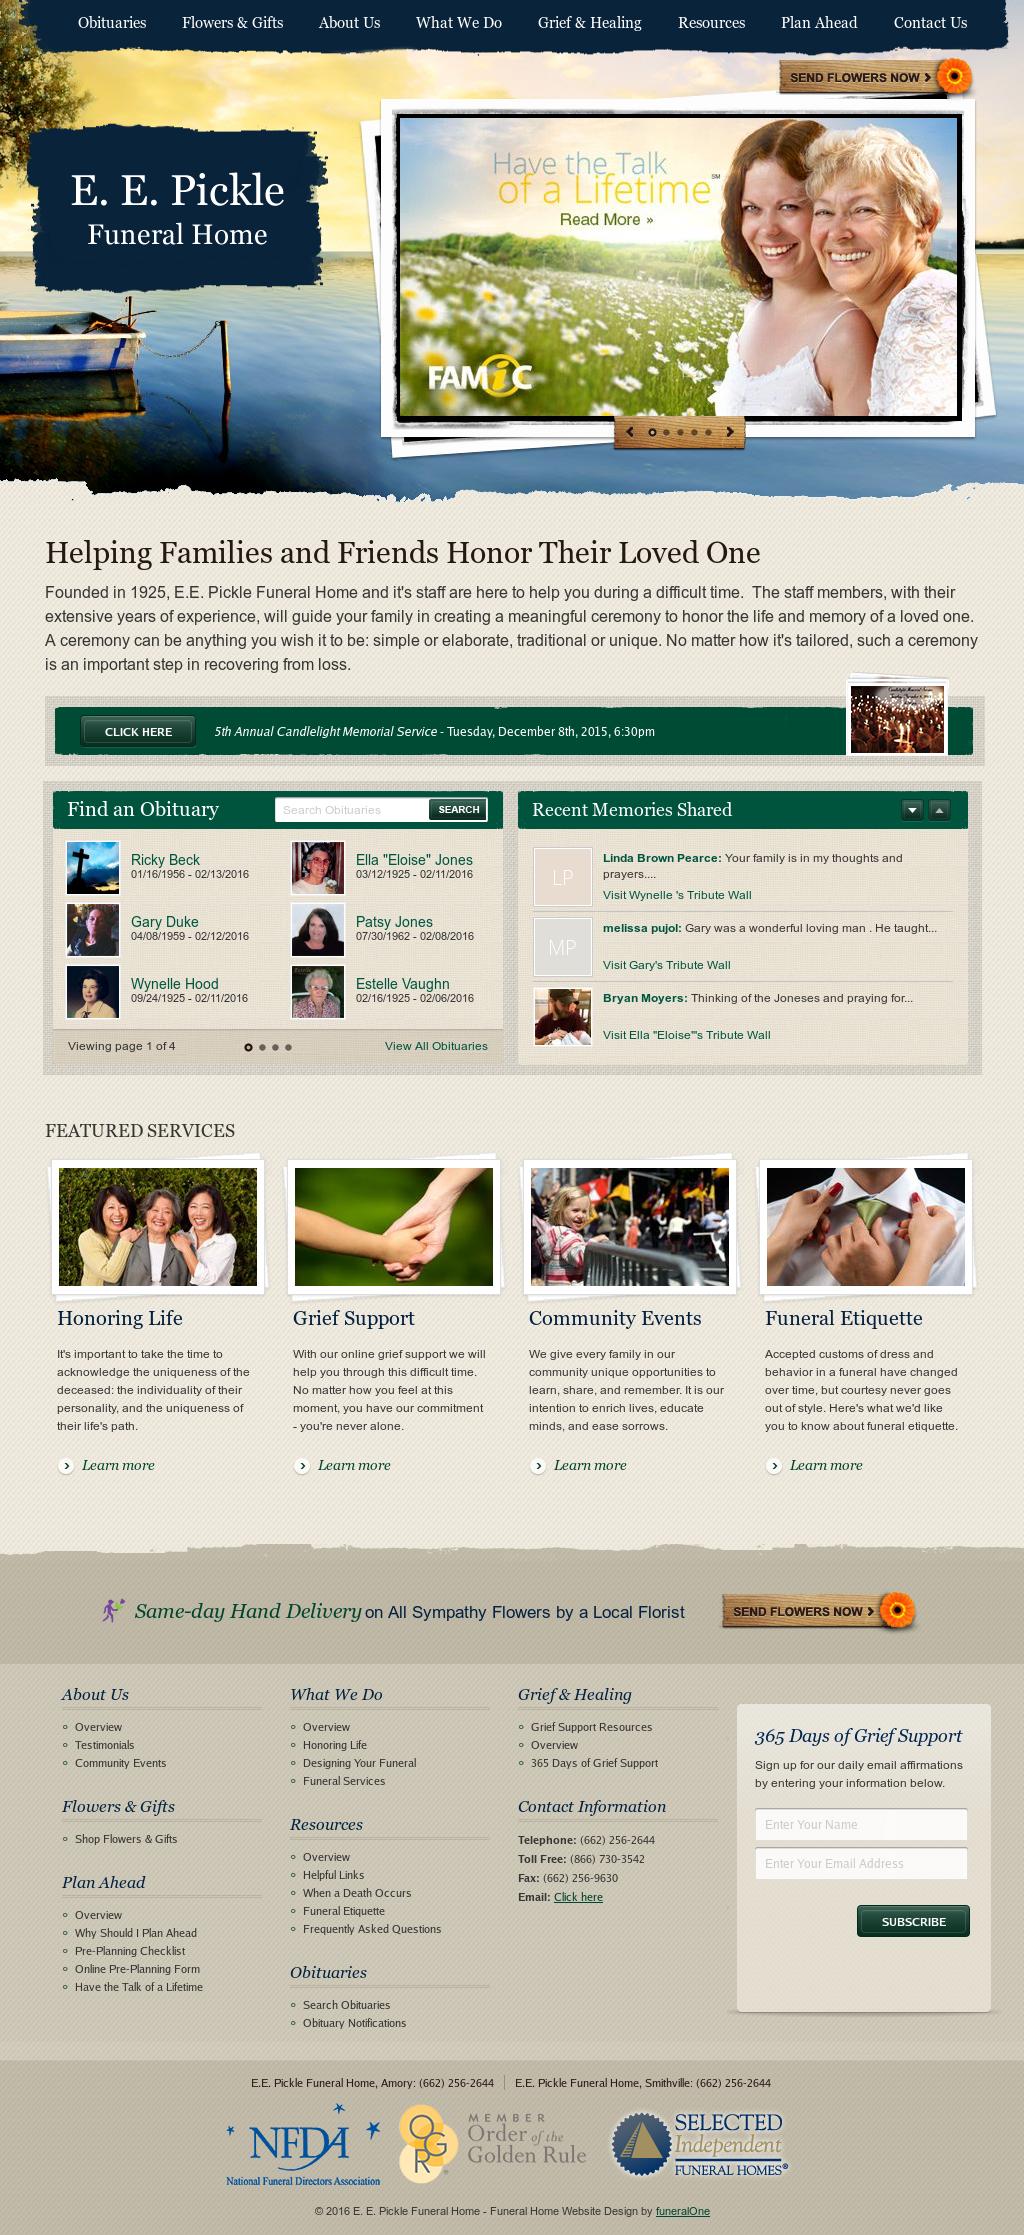 Funeral home web design